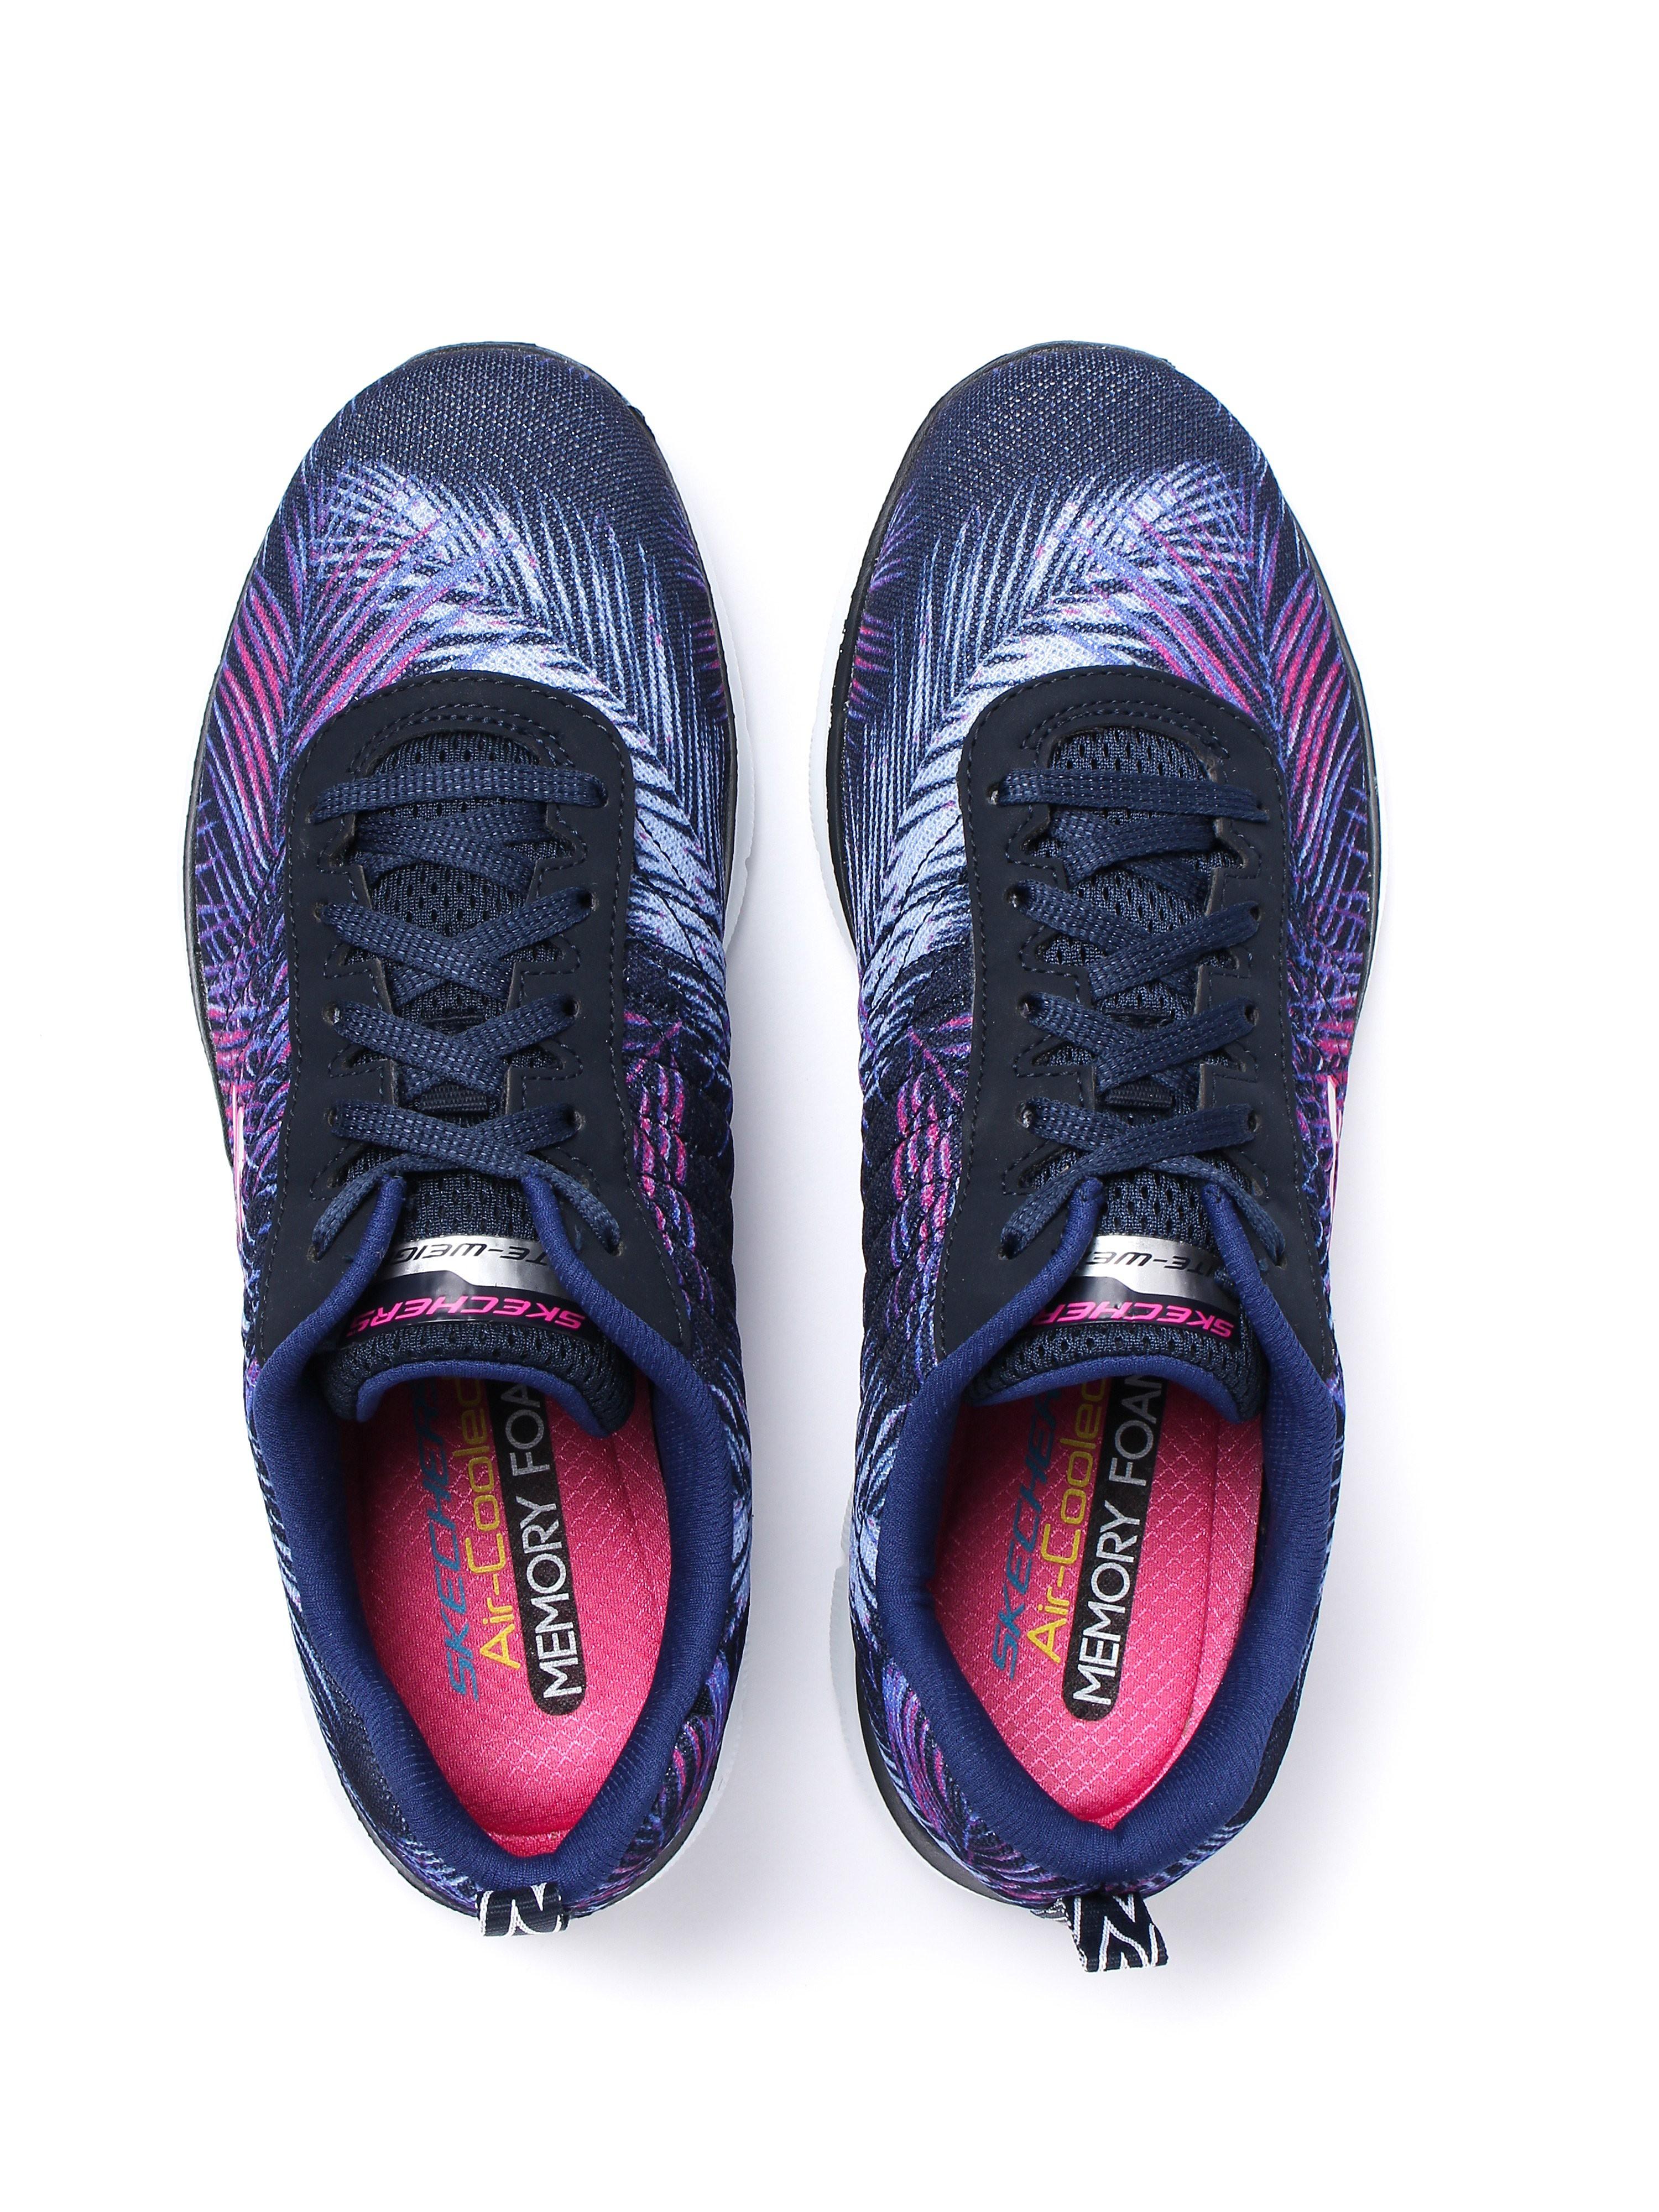 Skechers Women's Flex Appeal 2.0 Tropical Breeze Trainers - Navy/Pink